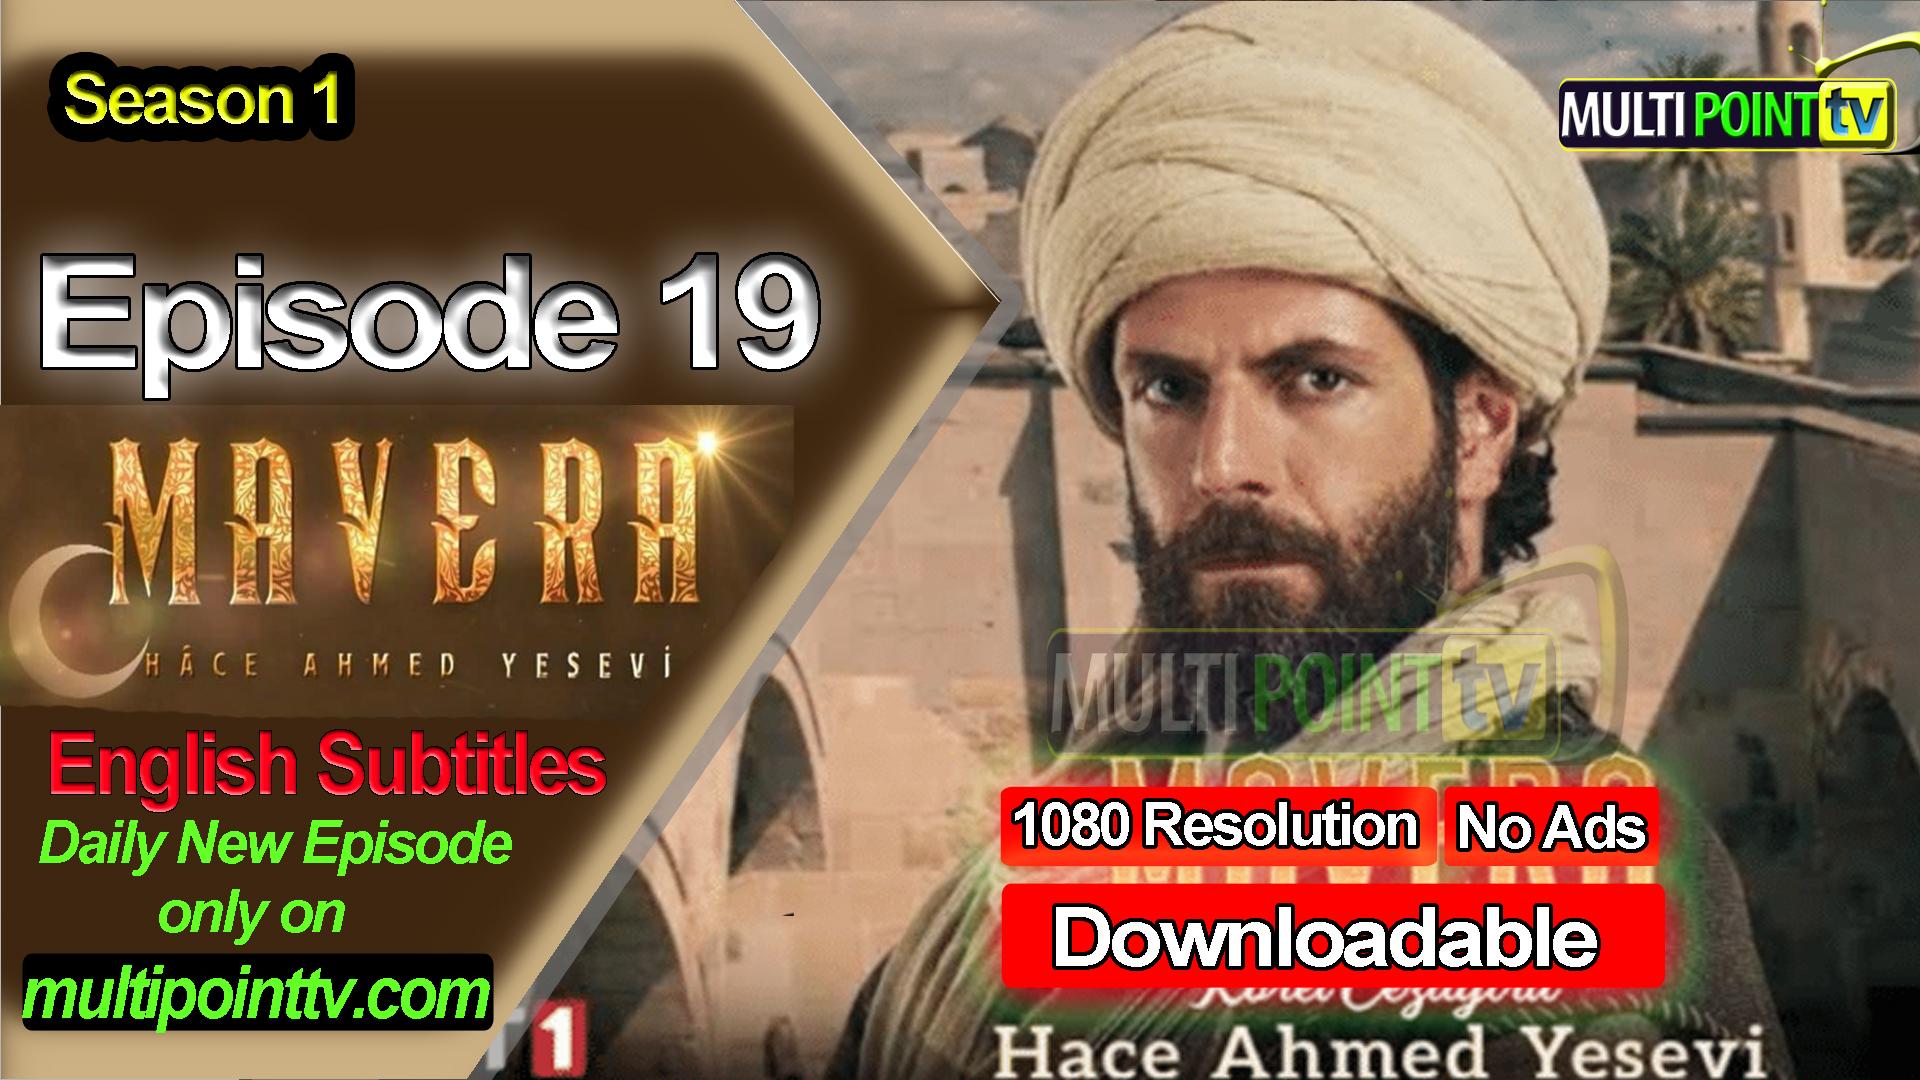 Mavera Episode 19 English Subtitles